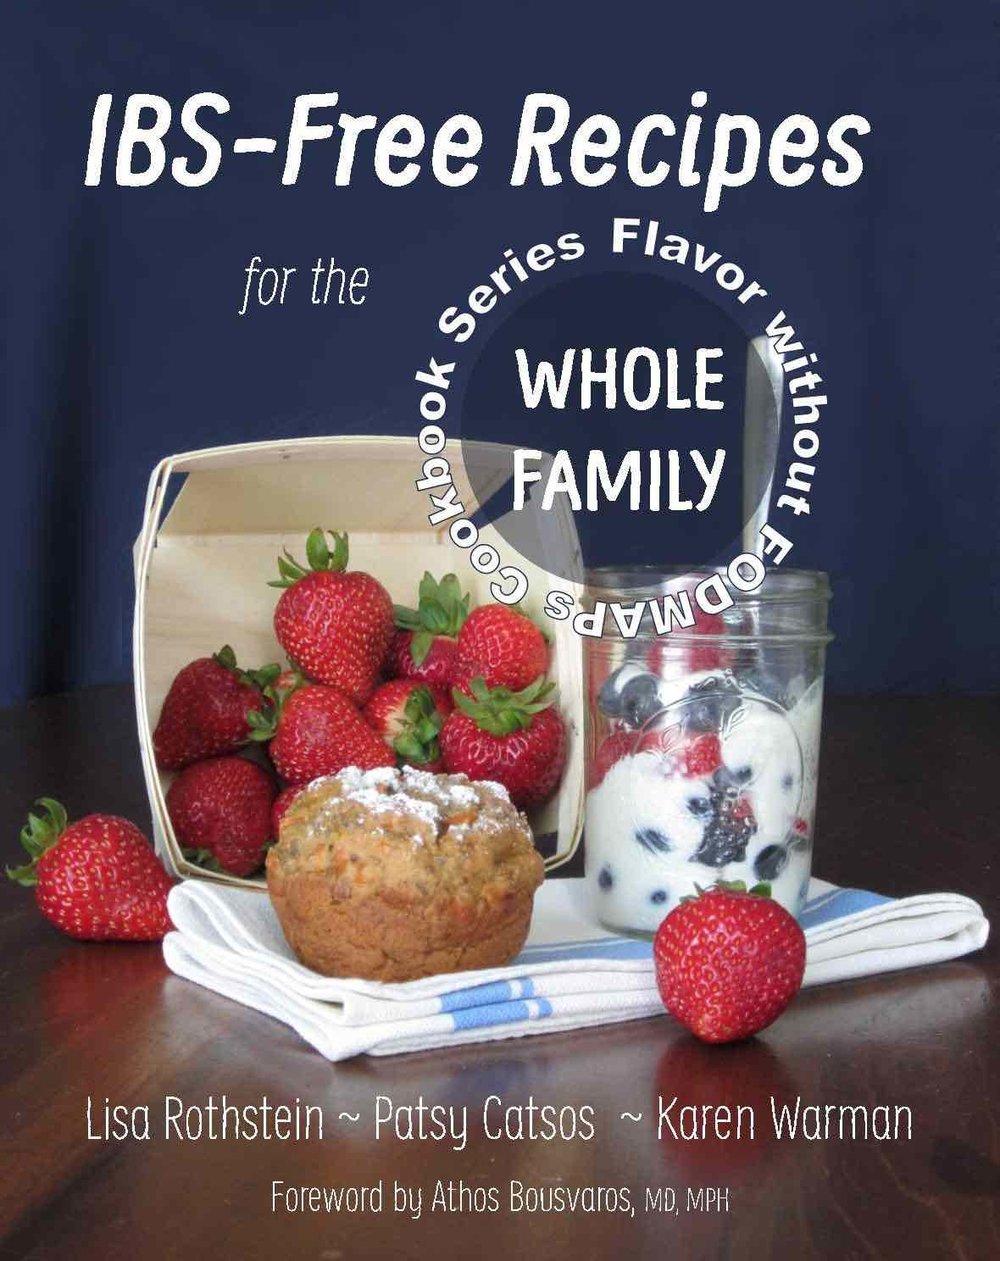 IBS-Free Recipes Kindle Cover Medium.jpg